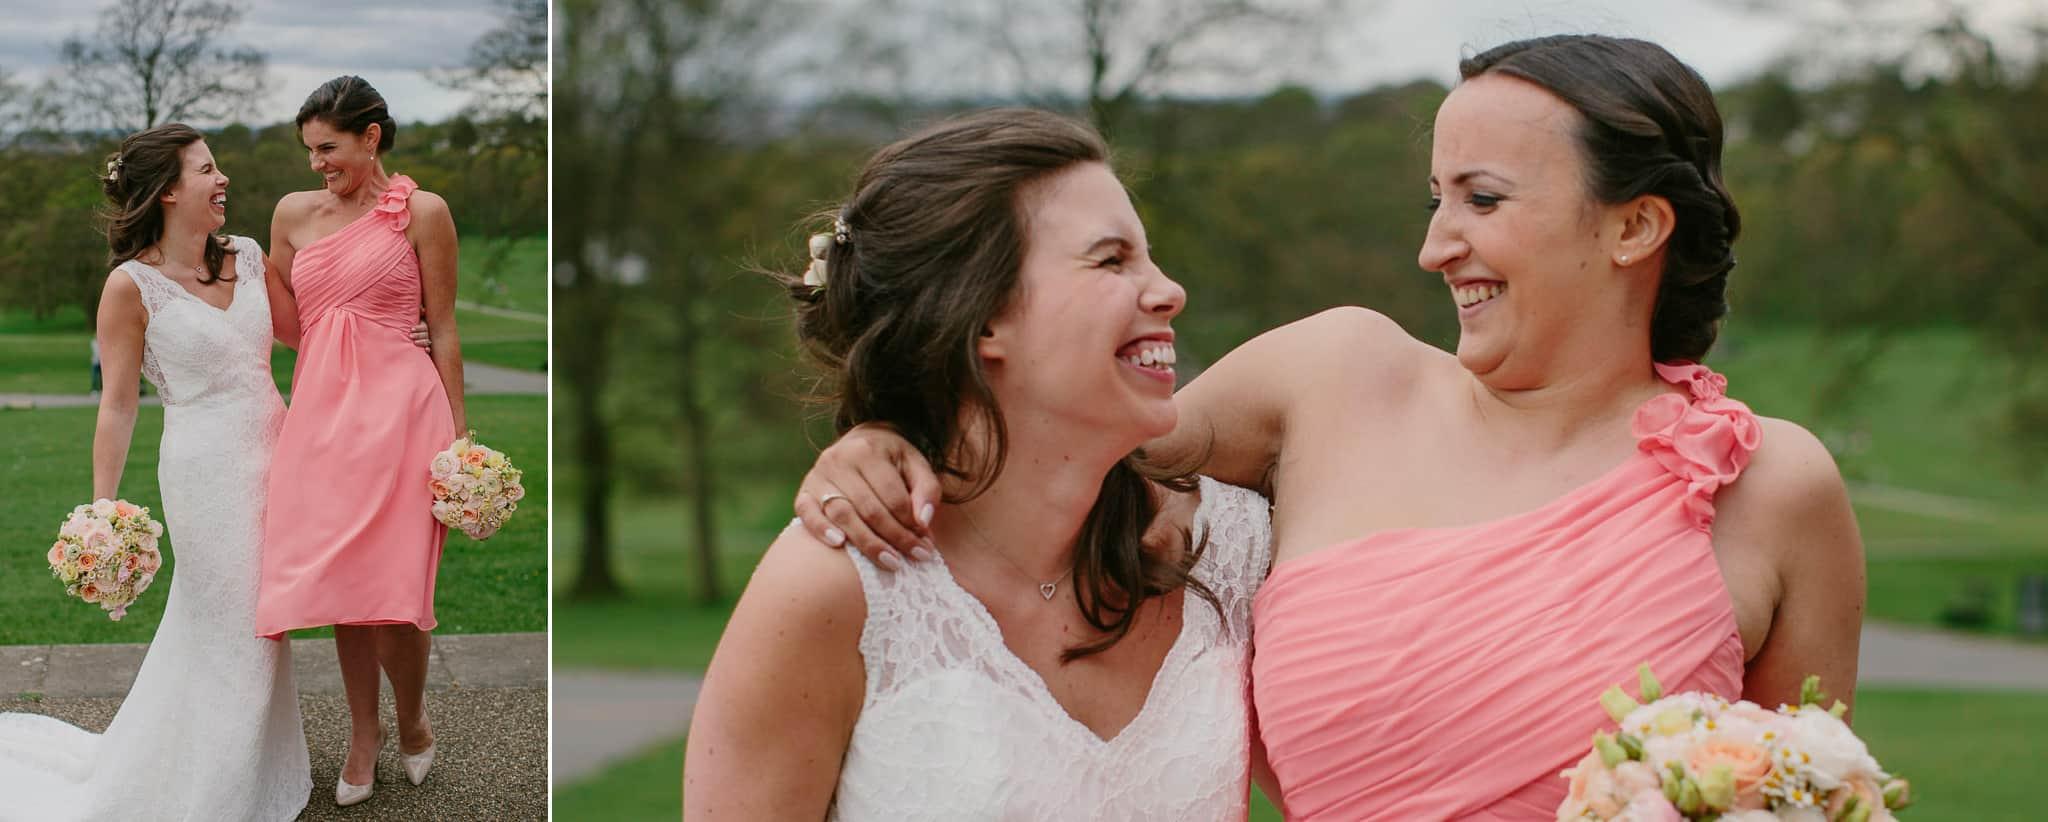 Sebastien Bicard • Wedding Photographer • Leeds, England •Spalding-36